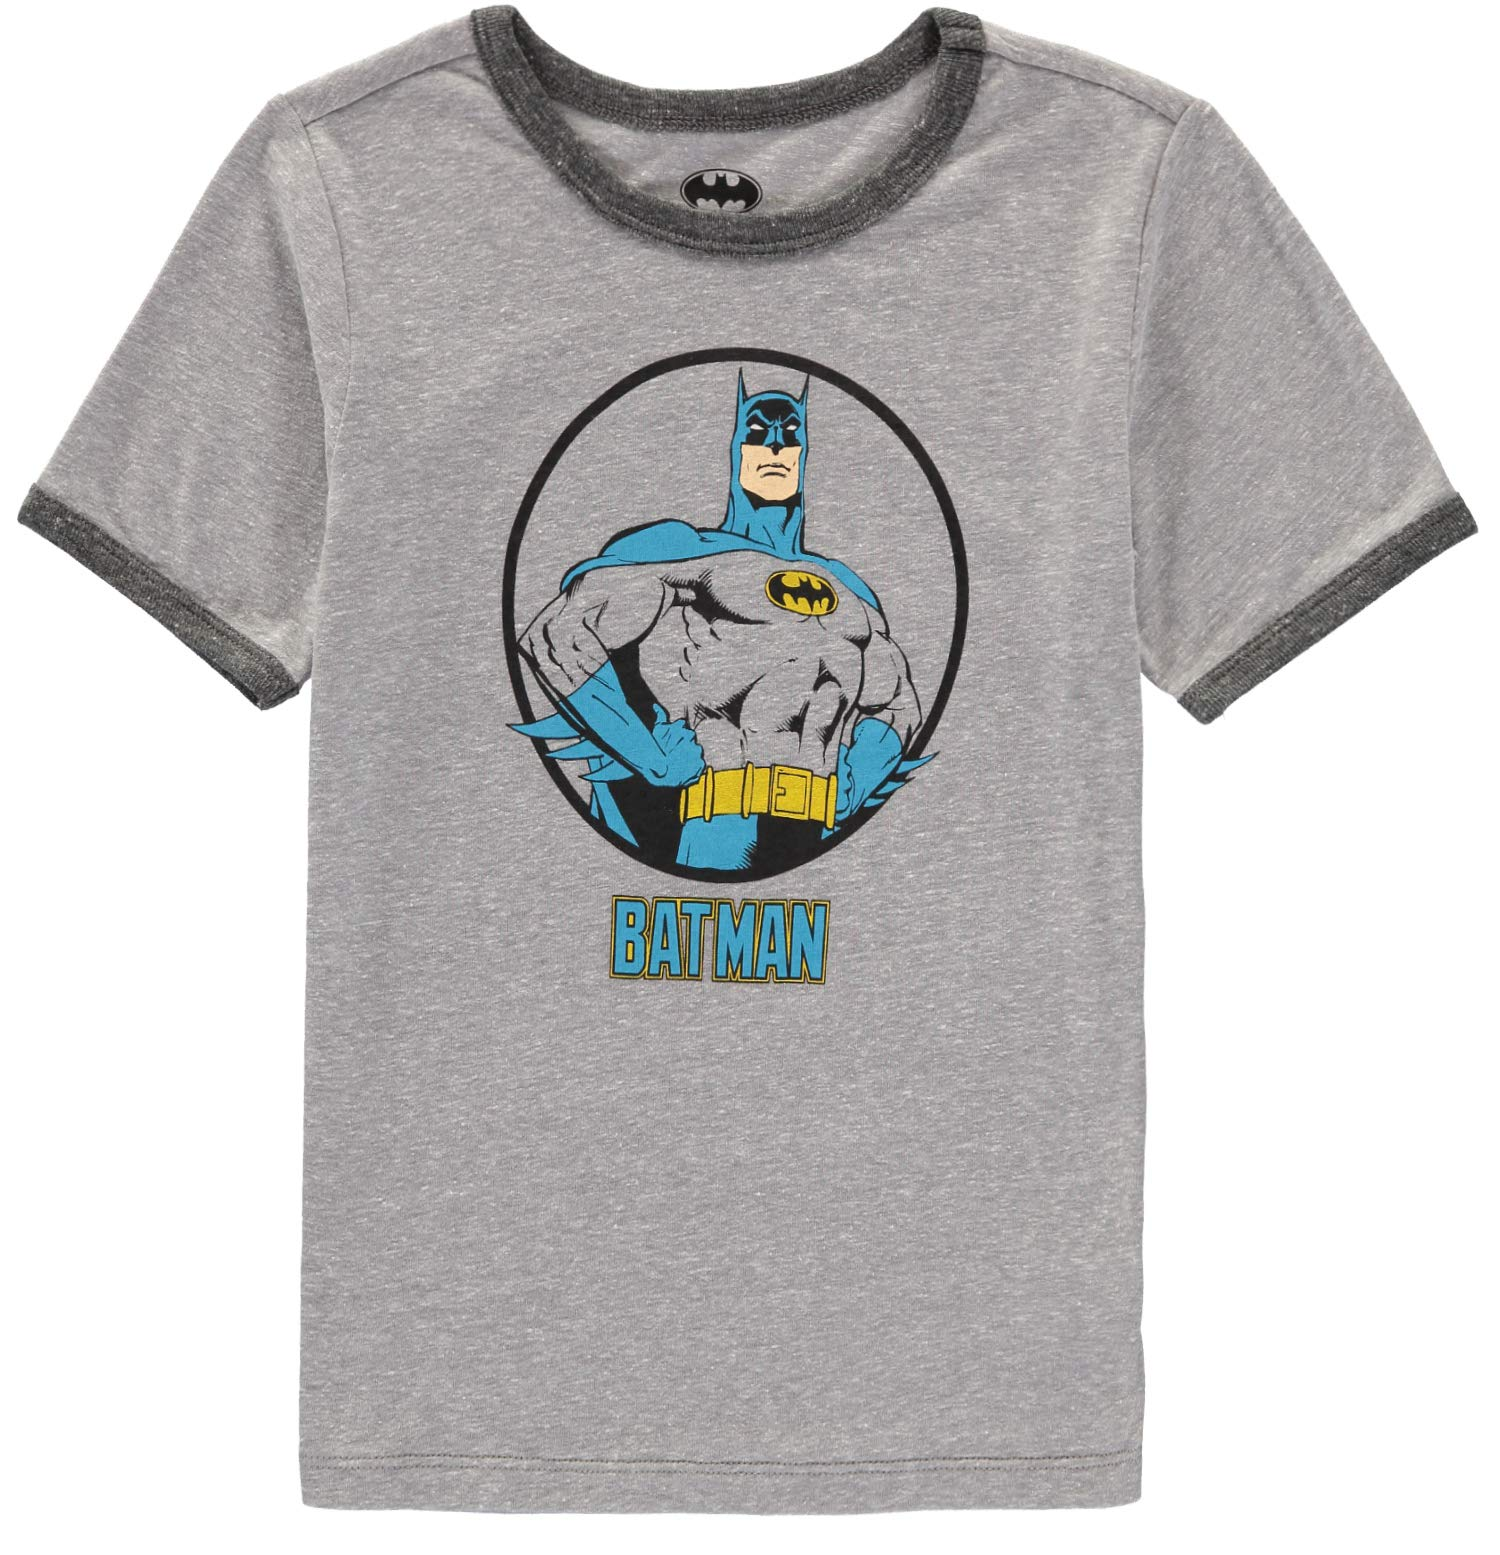 Happy Threads Toddler Boys Dark Grey Short Sleeve T-Shirt